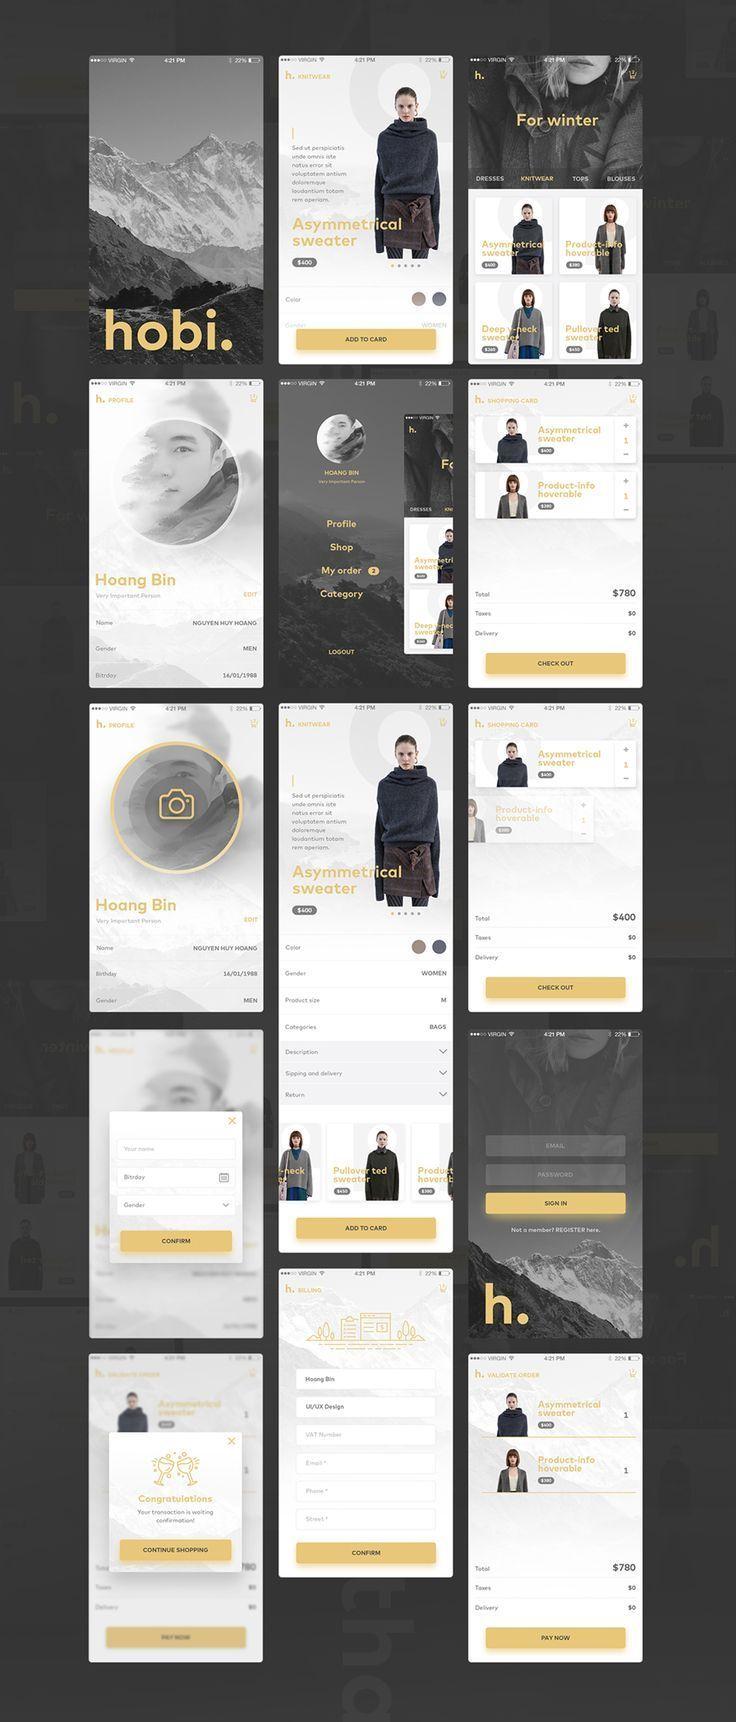 Hobi - Free UI PSD Mobile App. If you like UX, design, or design thinking, check out theuxblog.com